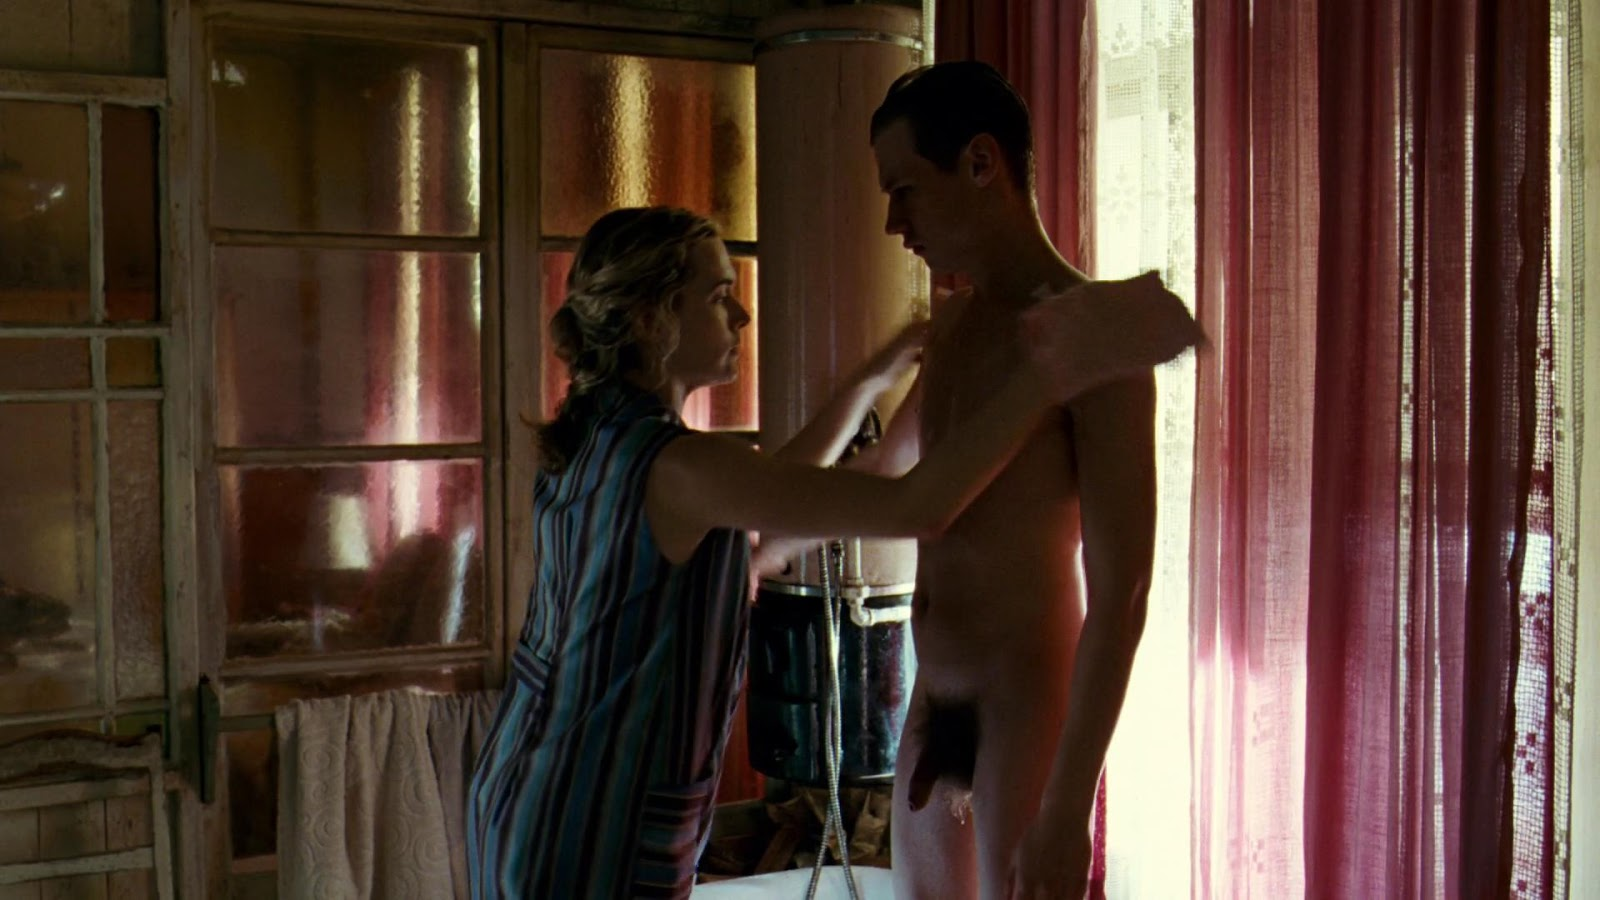 Can David kross nude scene consider